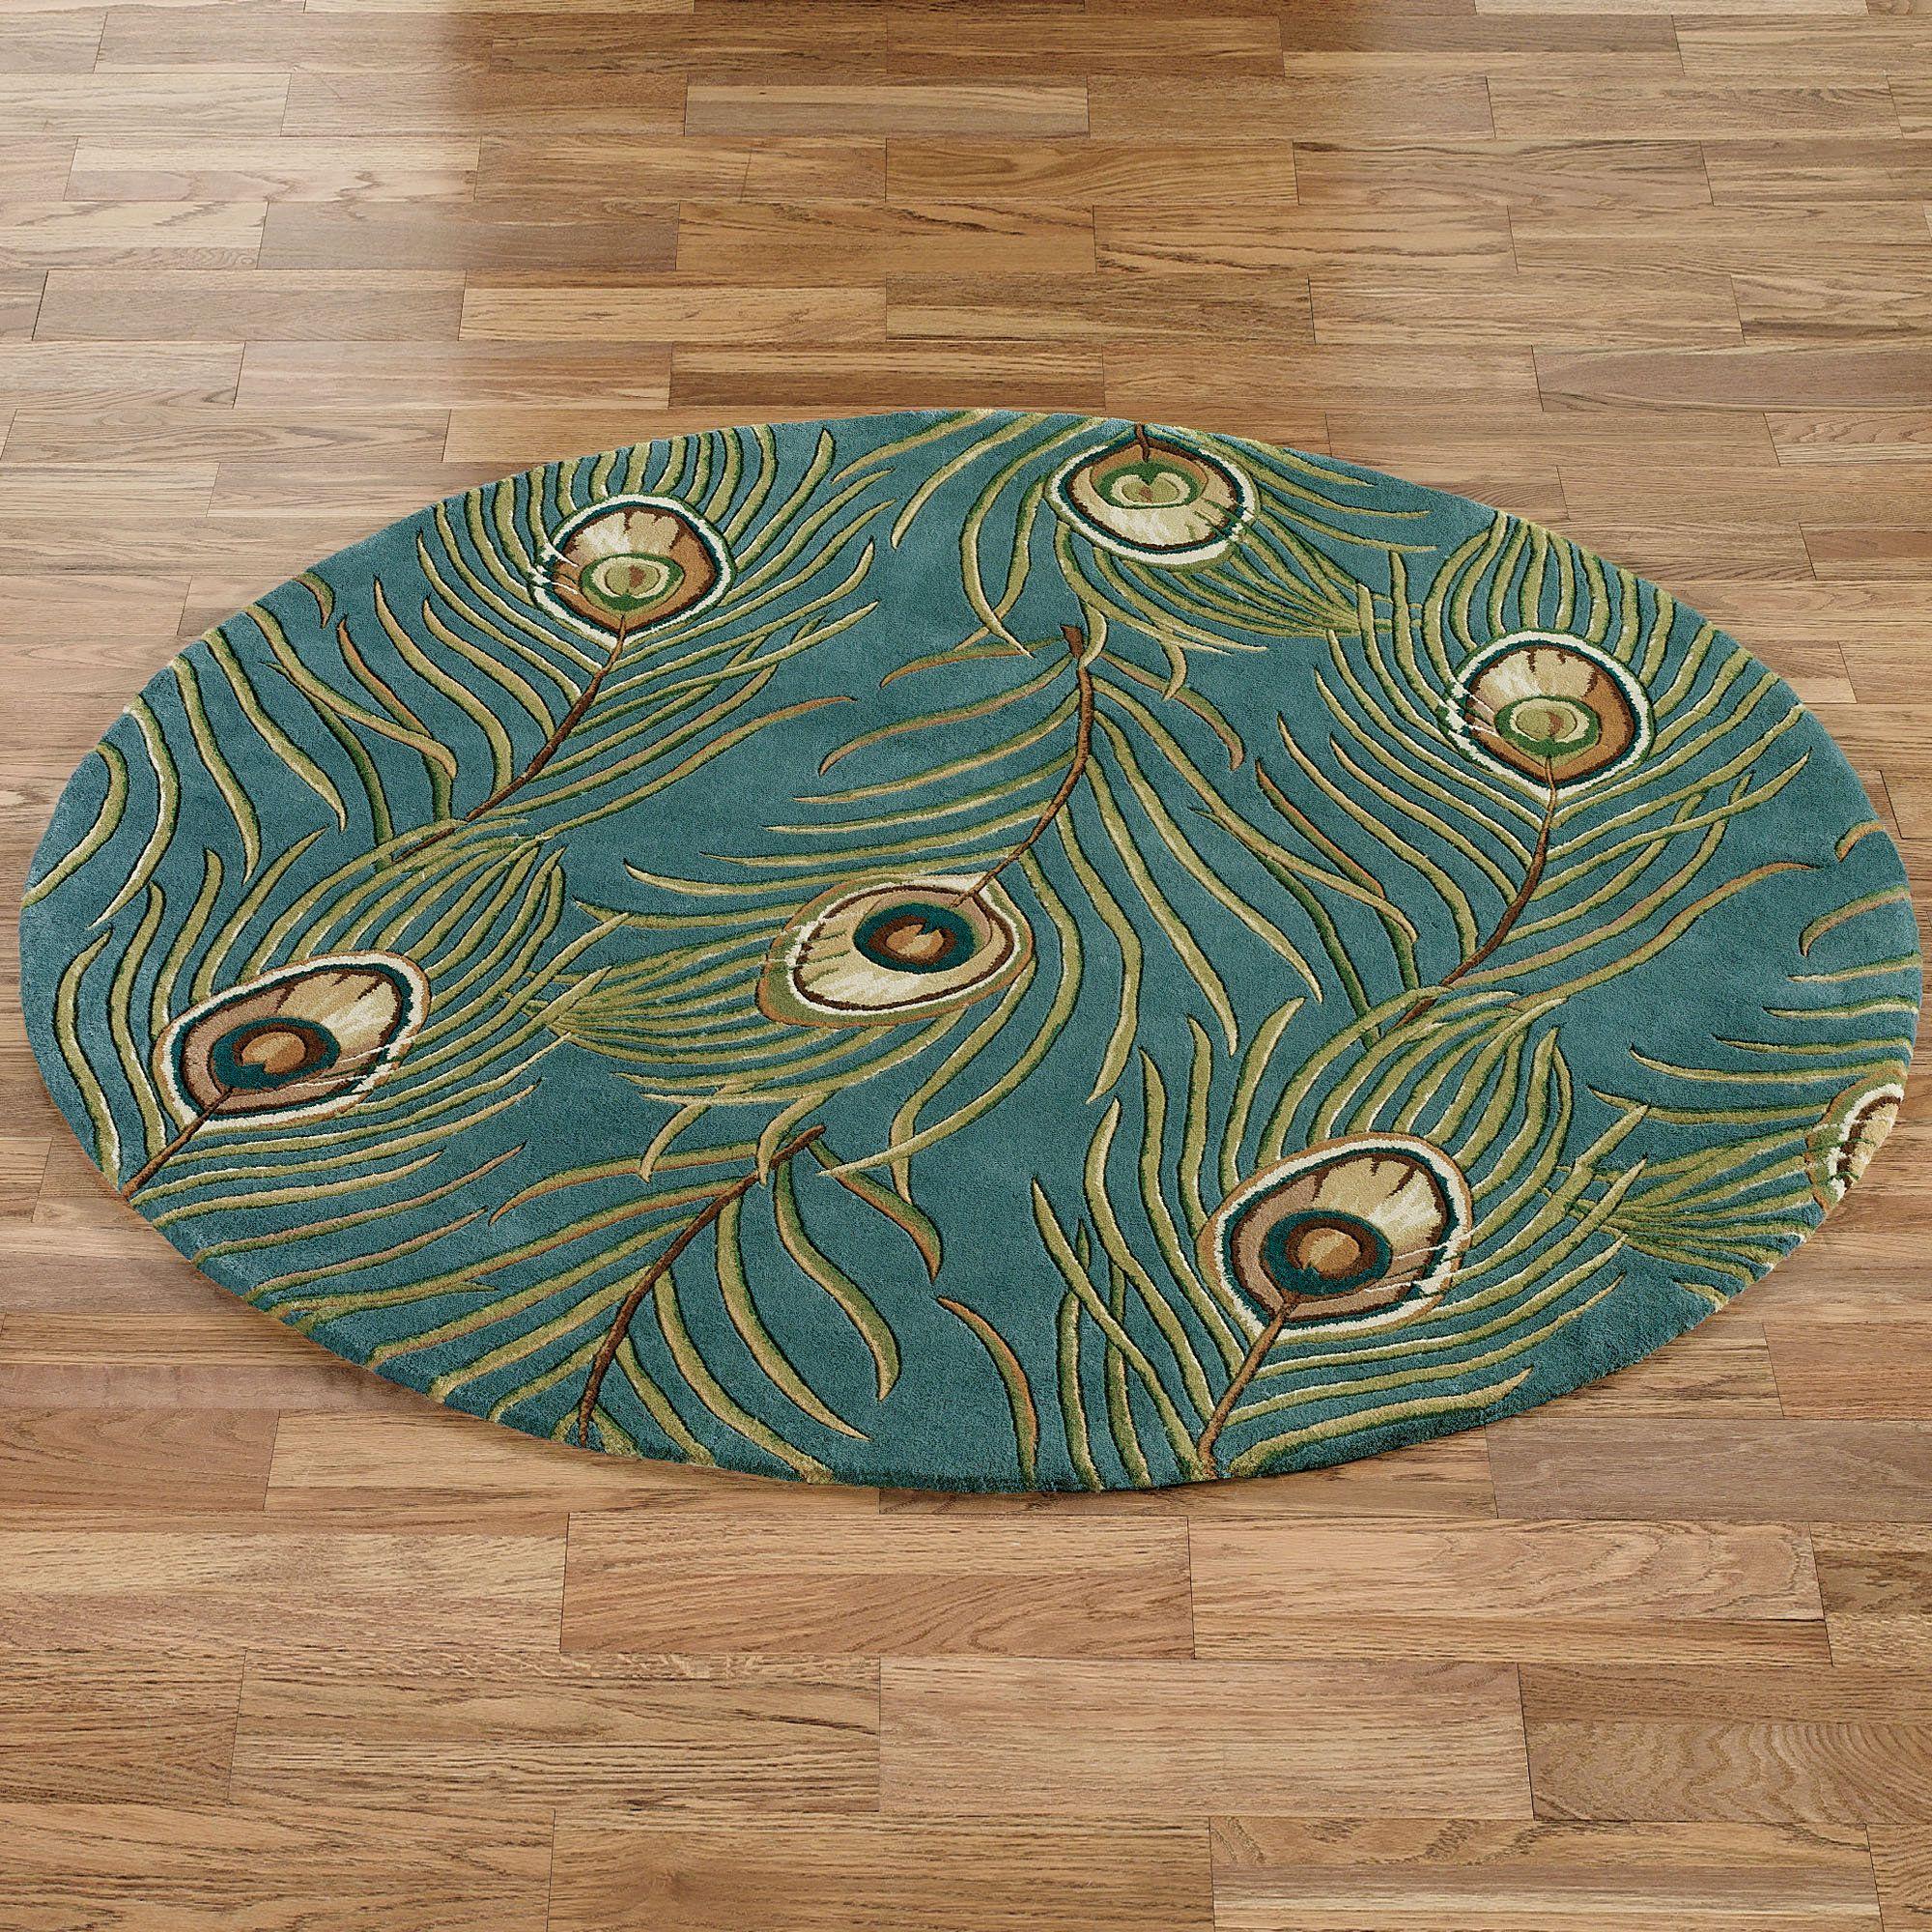 application with eyagci uk brown bathroom tiles bathmat rugs glossy buy homefurry sky in perfect peacock greyish online rug com example fantastic bath luxury